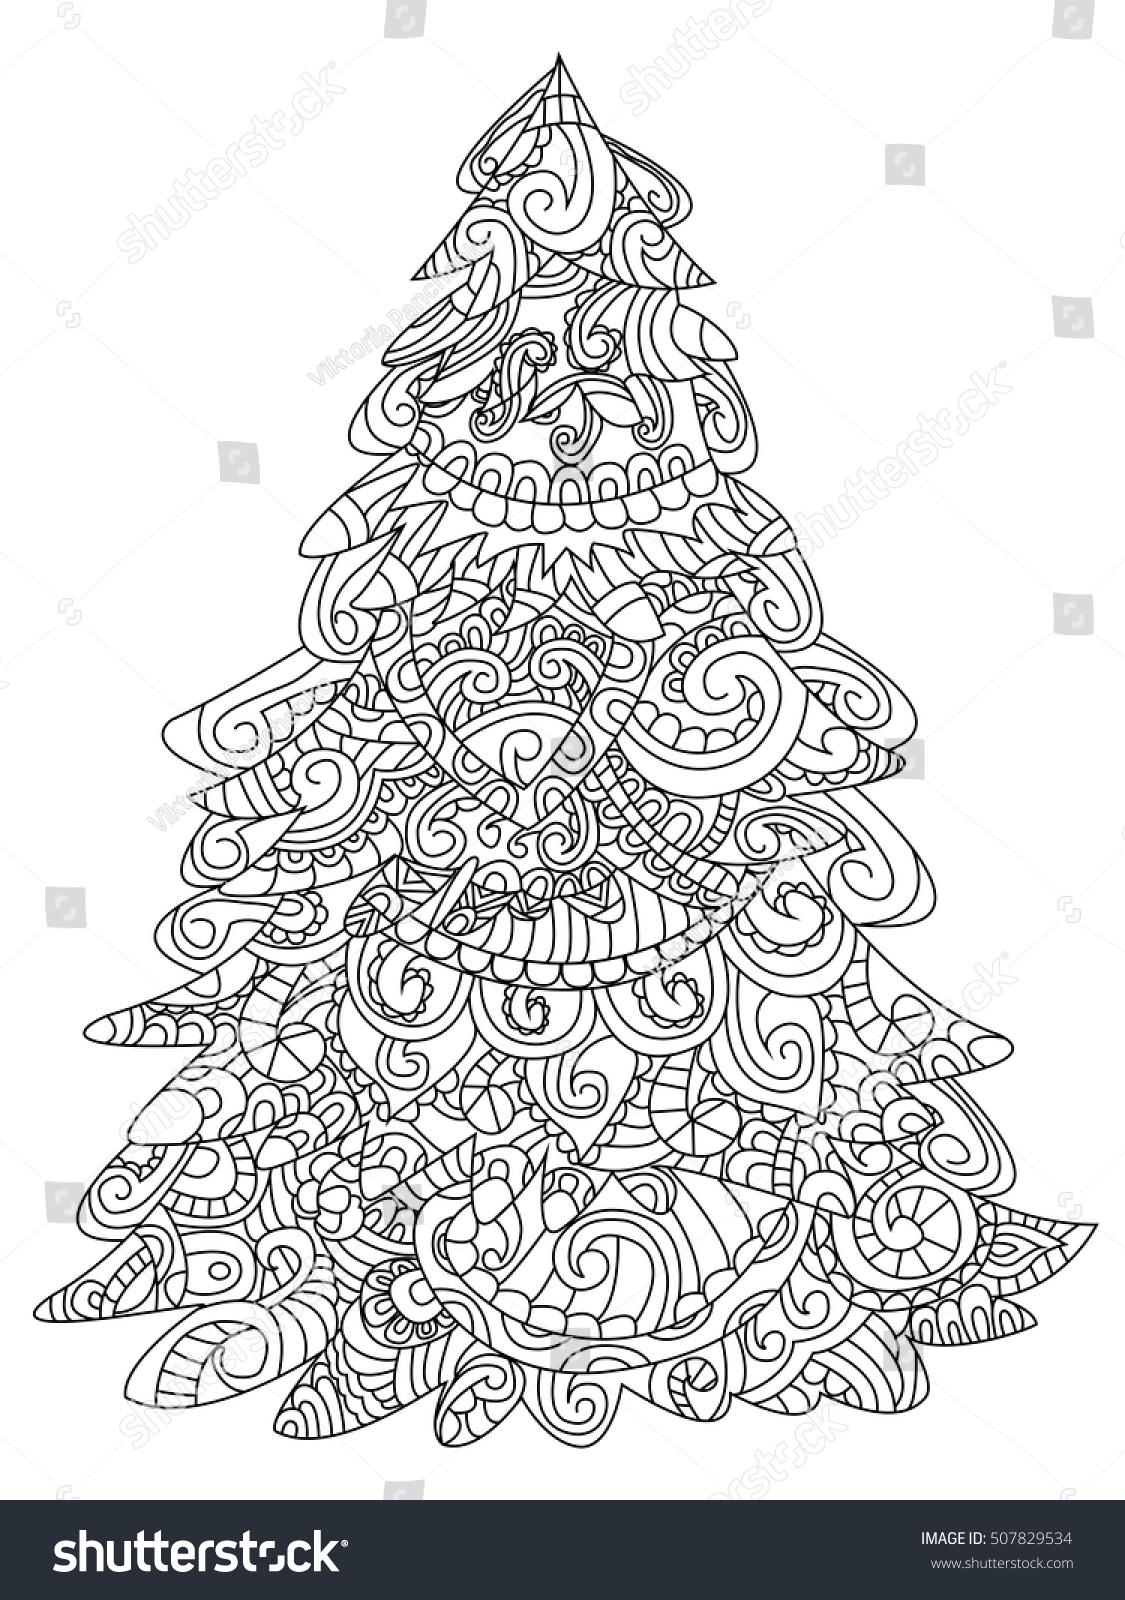 Christmas Tree Coloring Book Raster Illustration Stock Illustration ...